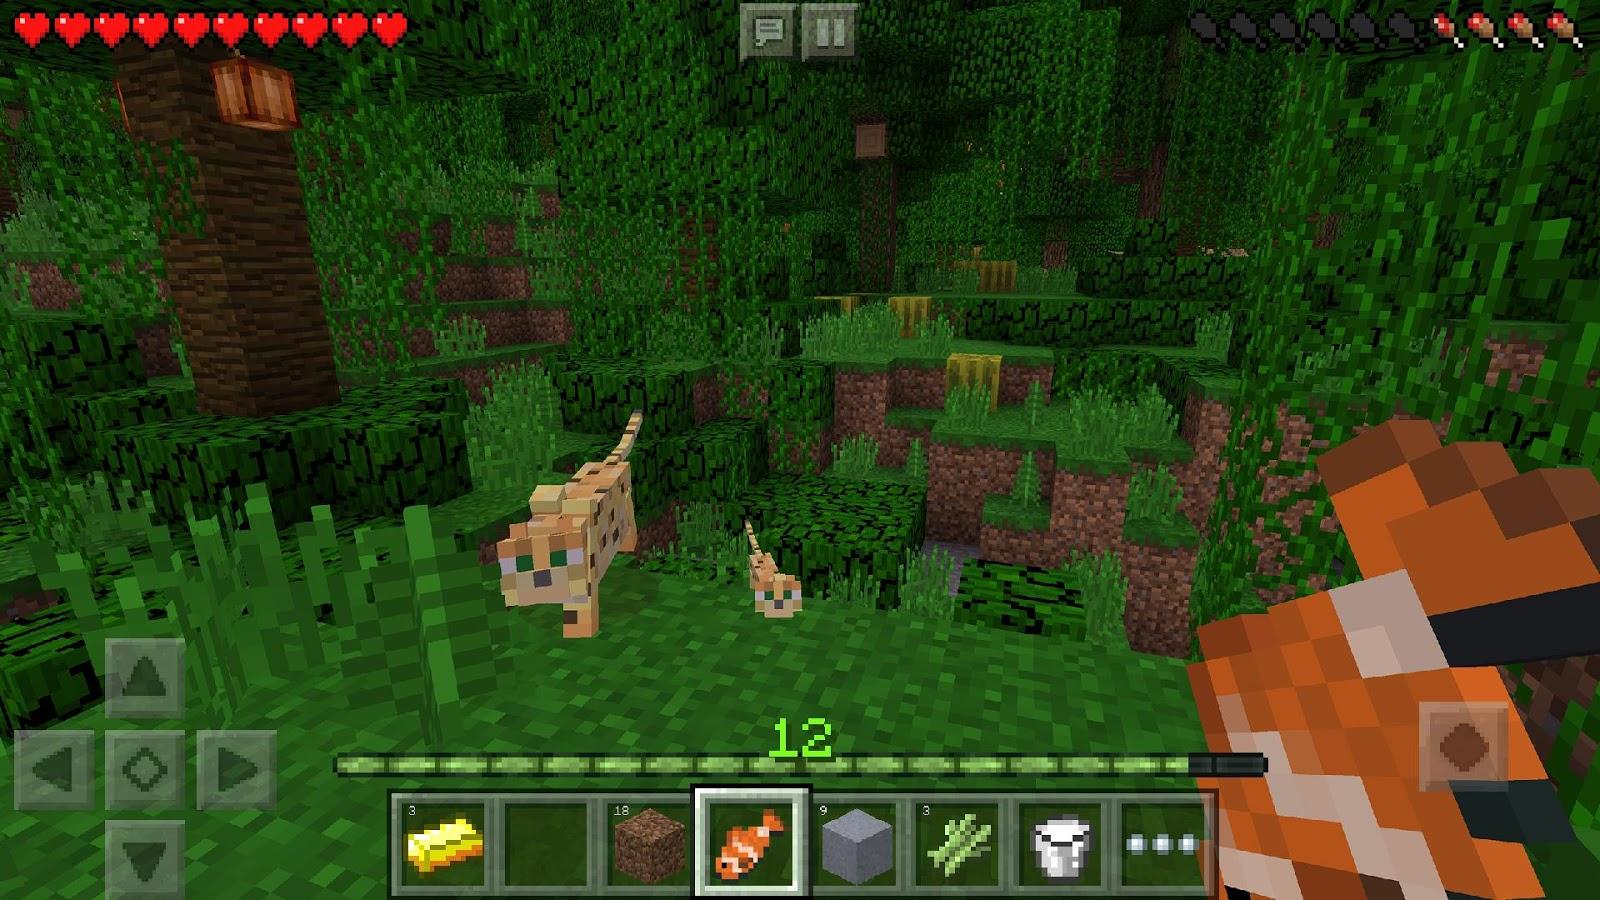 minecraft free download full version 1.8